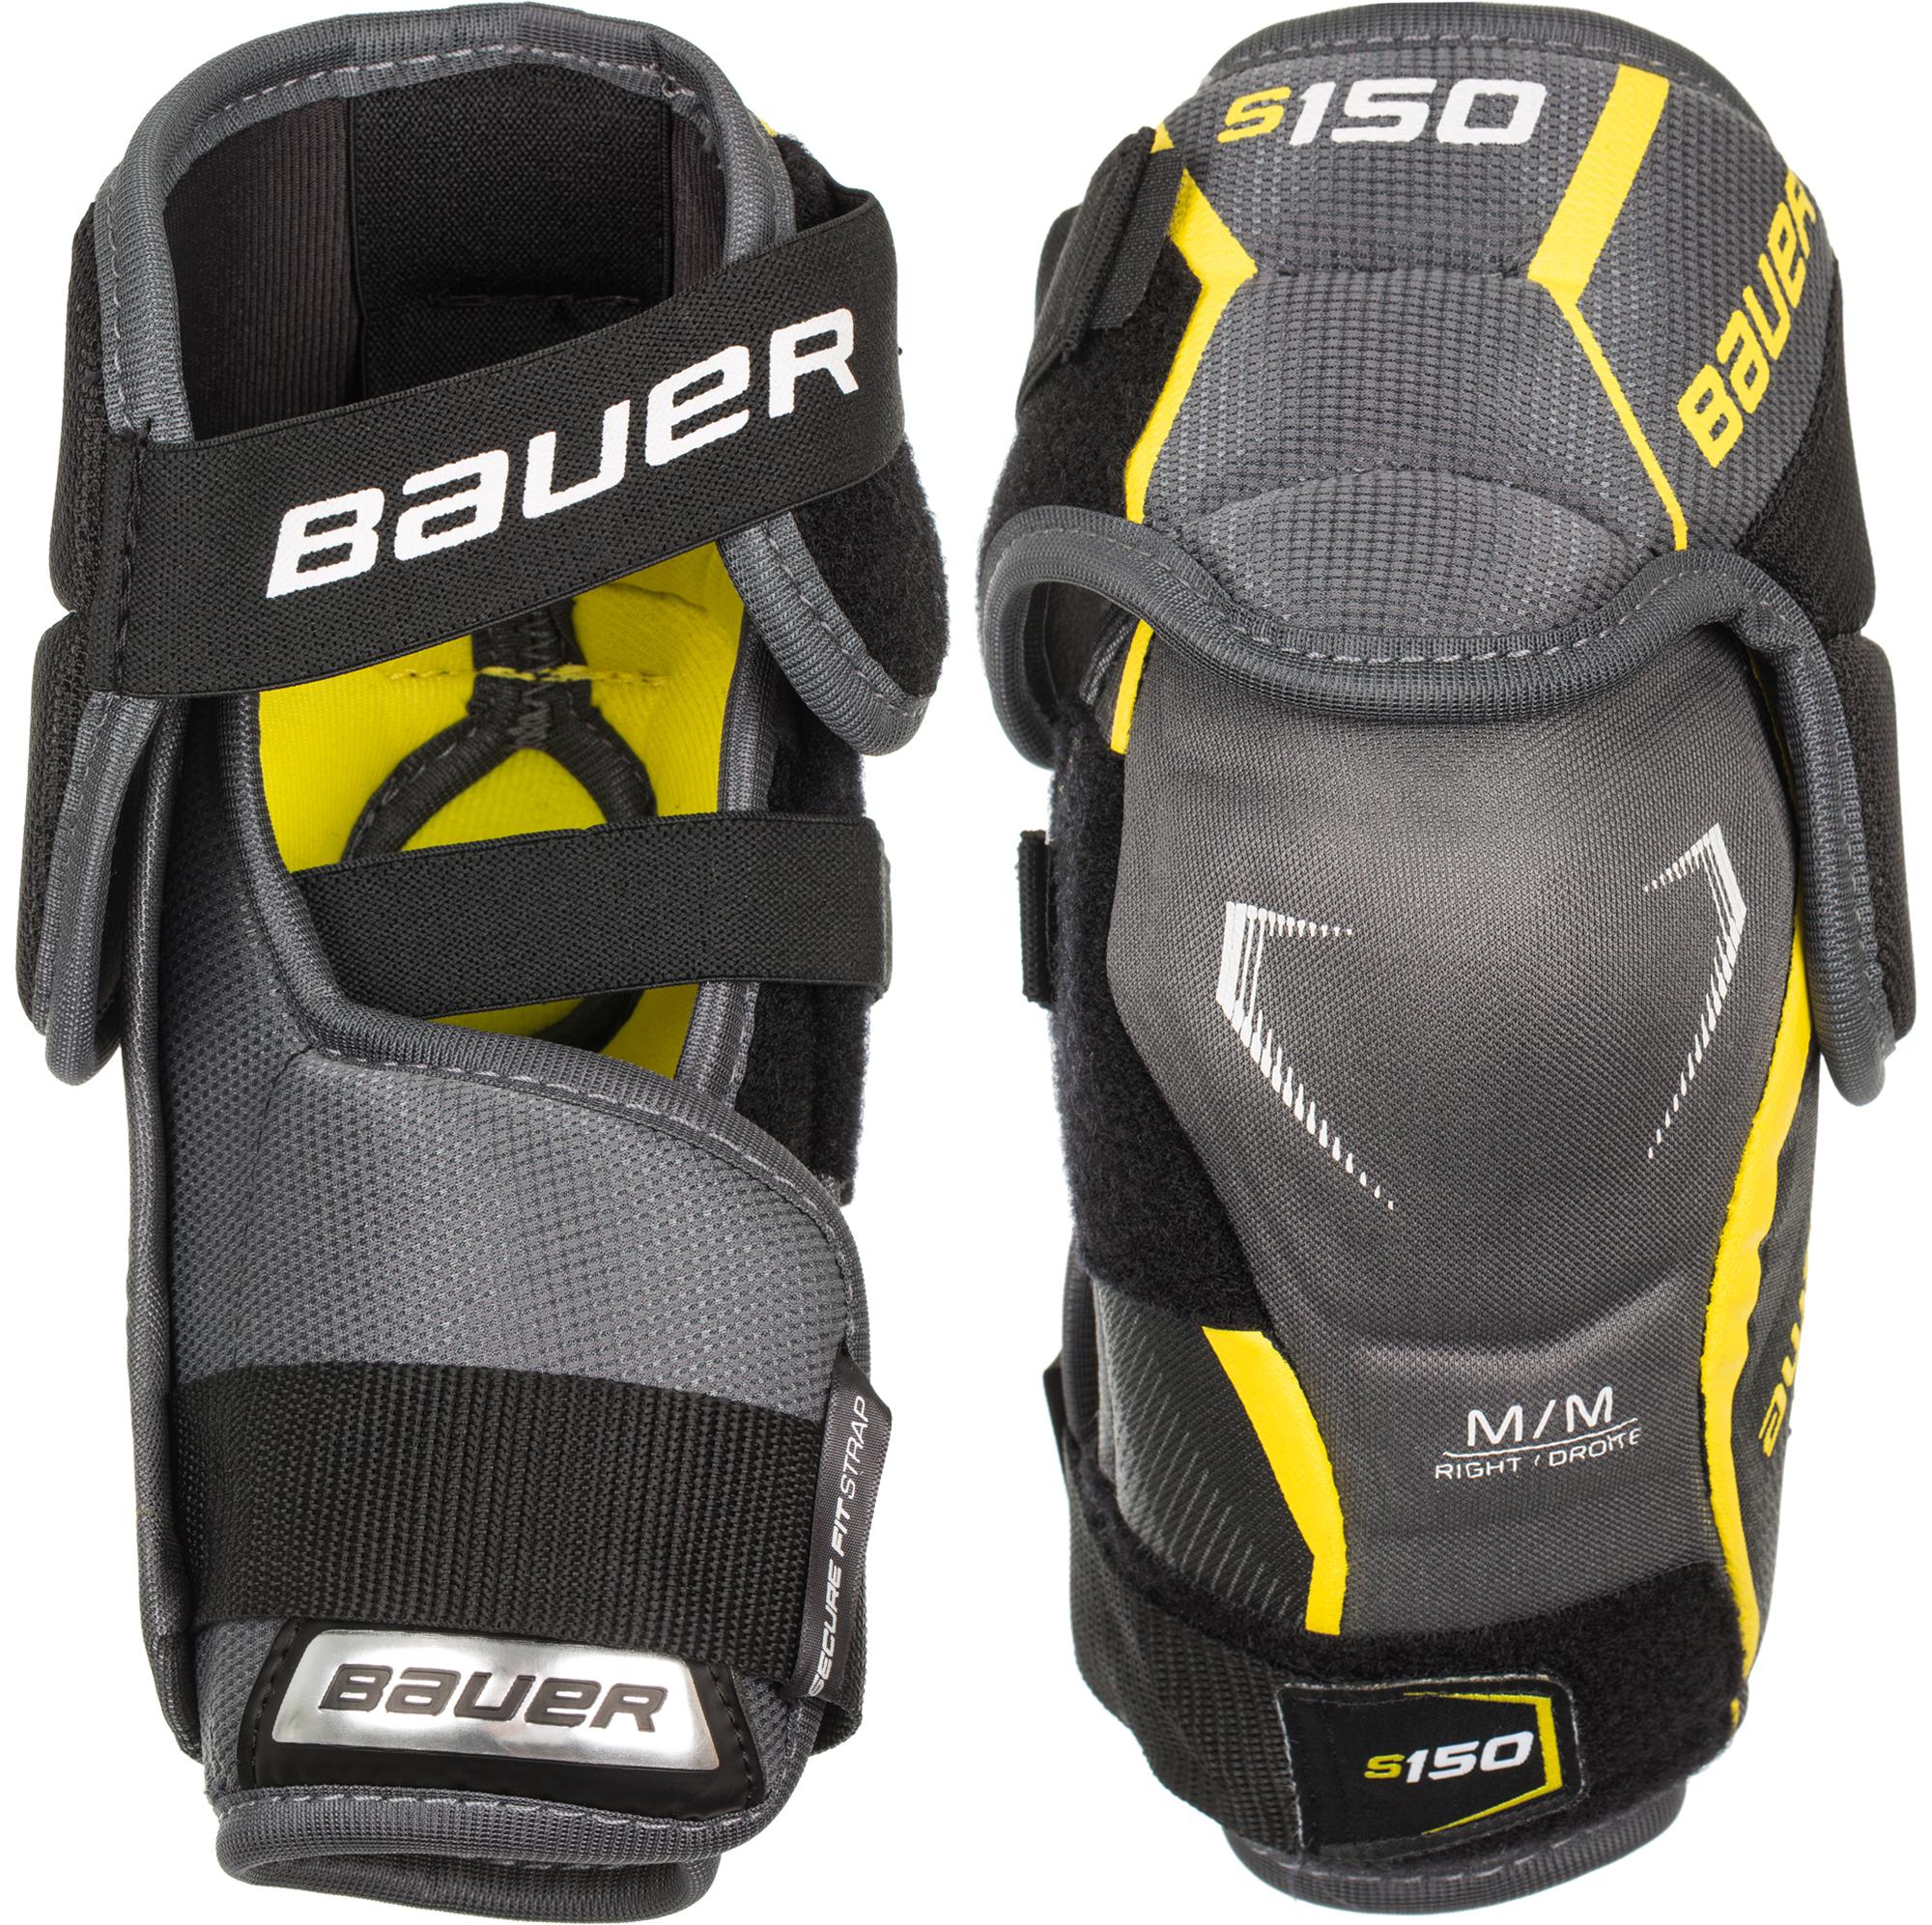 Bauer Налокотники хоккейные Bauer S17 Supreme S150 bauer belinda shut eye the bauer belinda